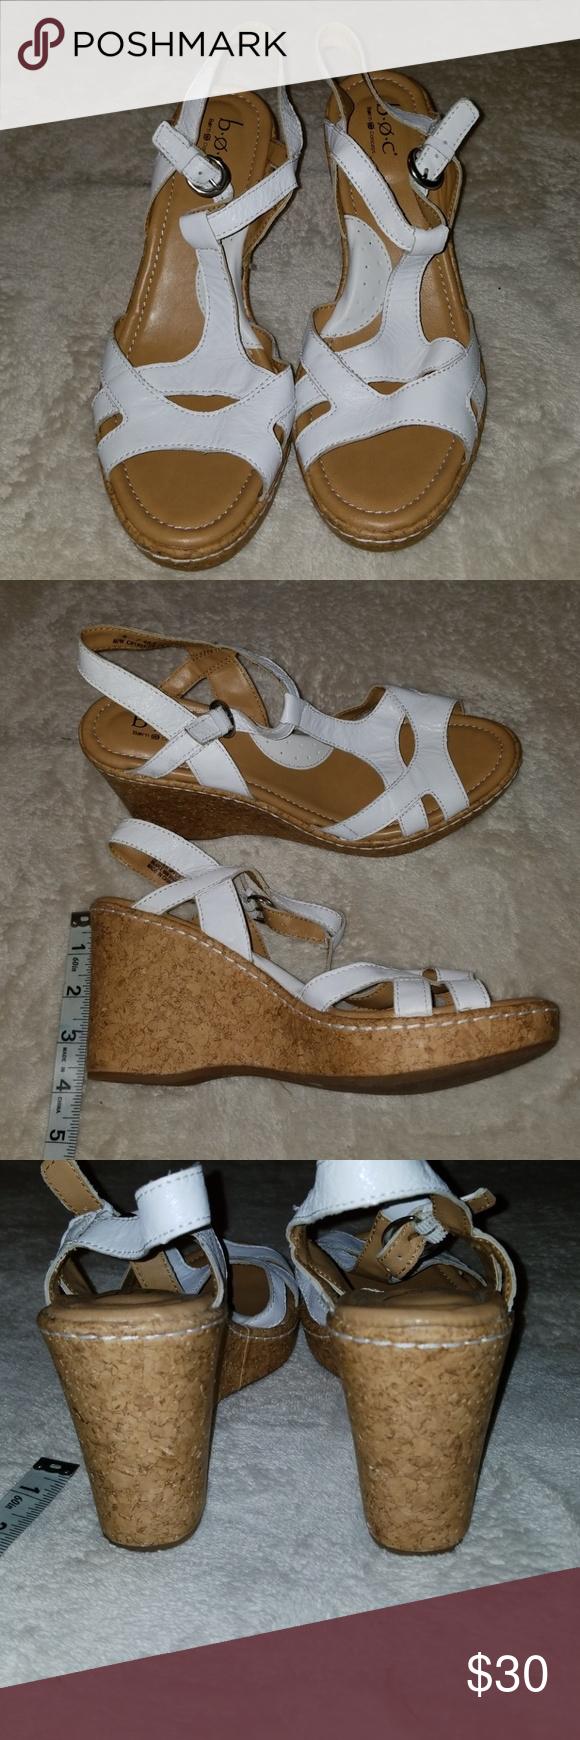 794b198f86 NEW Born BOC Wedge Sandles New white leather wedge cork heeled Sandals.  Size 9M.